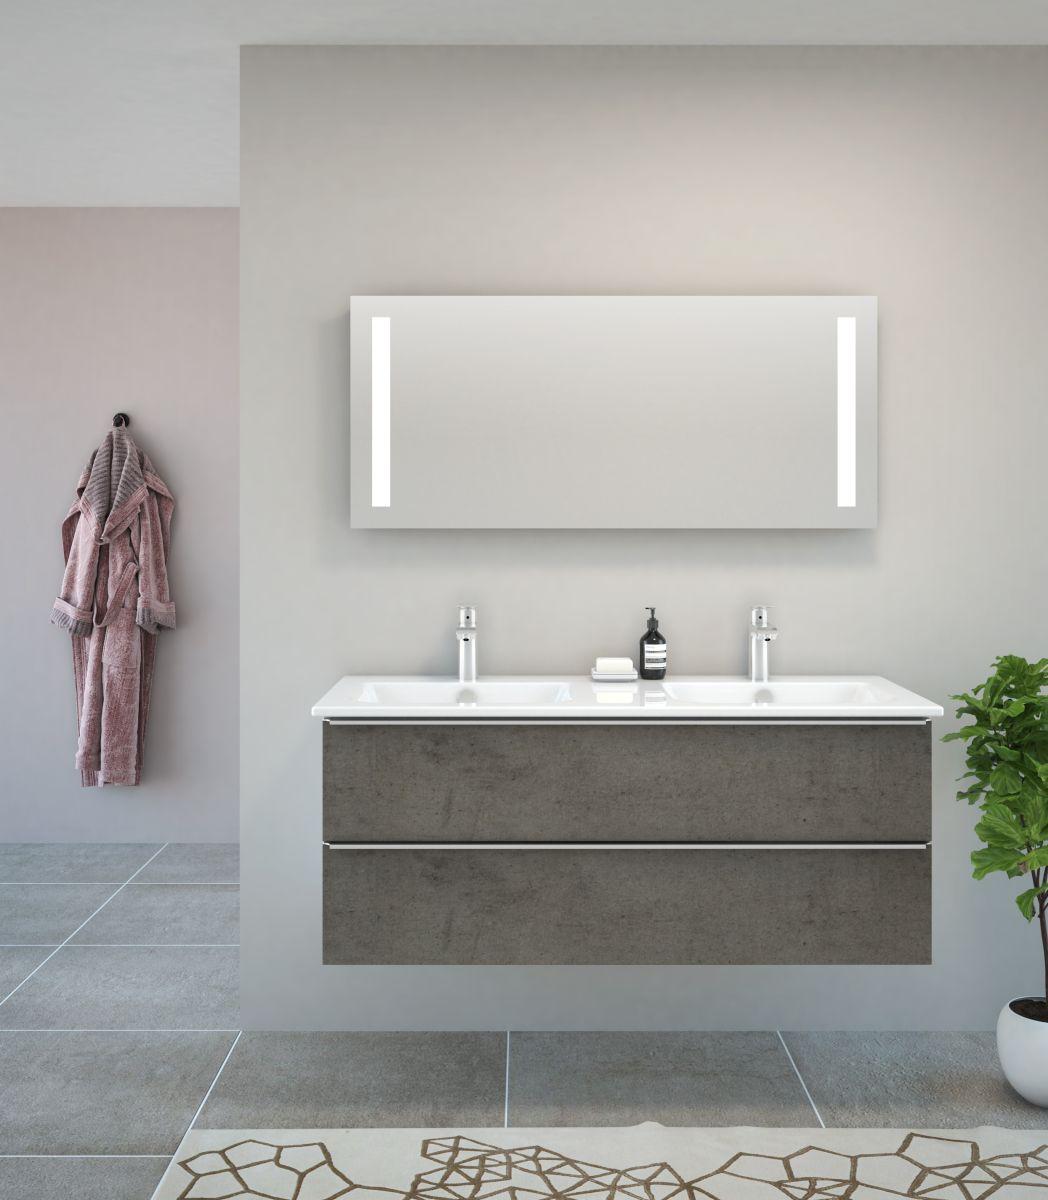 aquaestil petrokov kupaonski namještaj